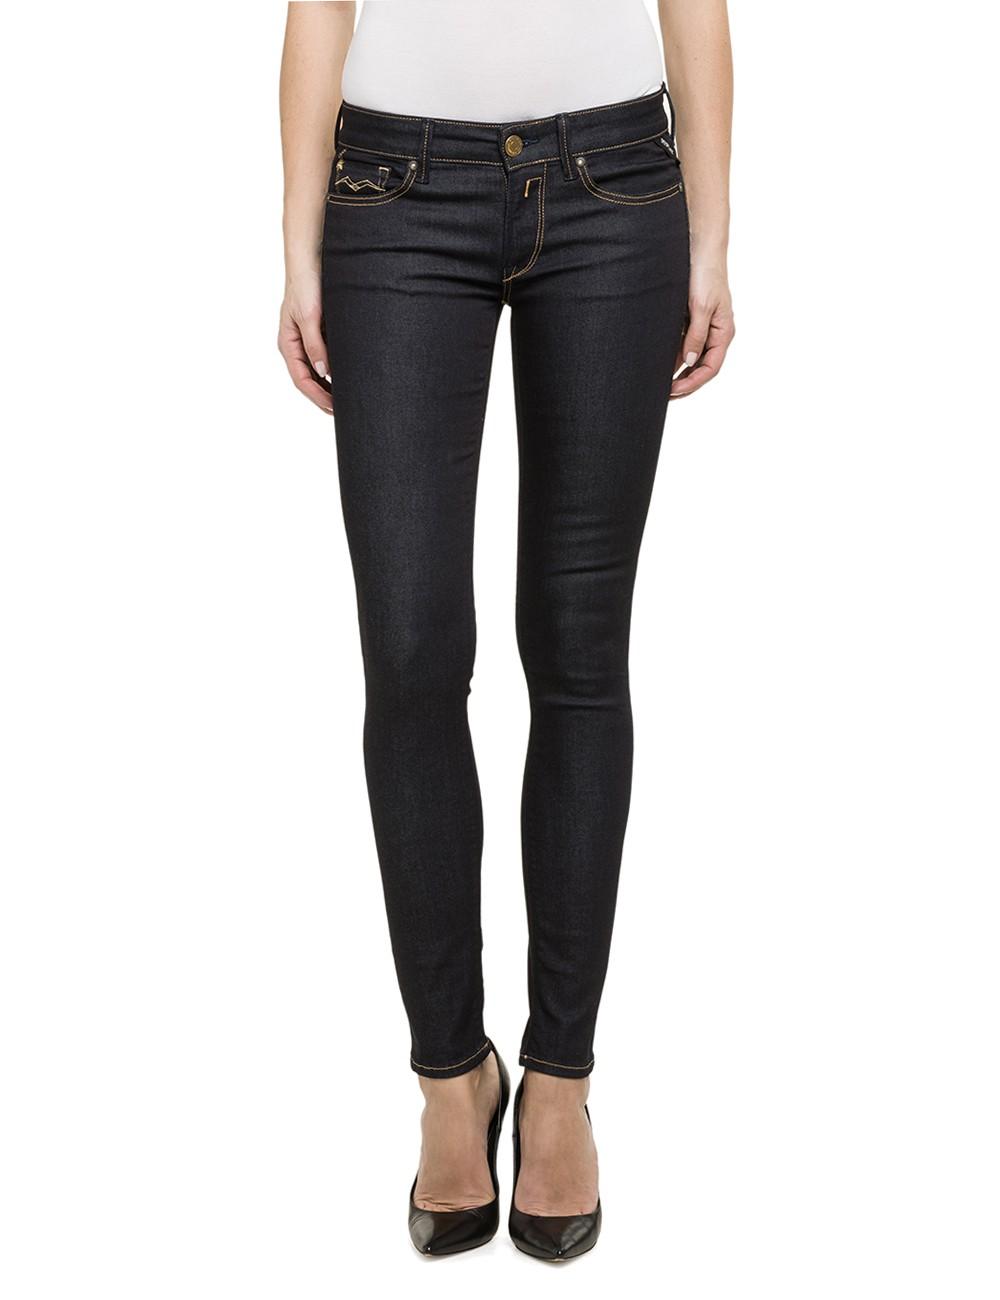 replay damen jeans luz skinny fit dark indigo kaufen. Black Bedroom Furniture Sets. Home Design Ideas